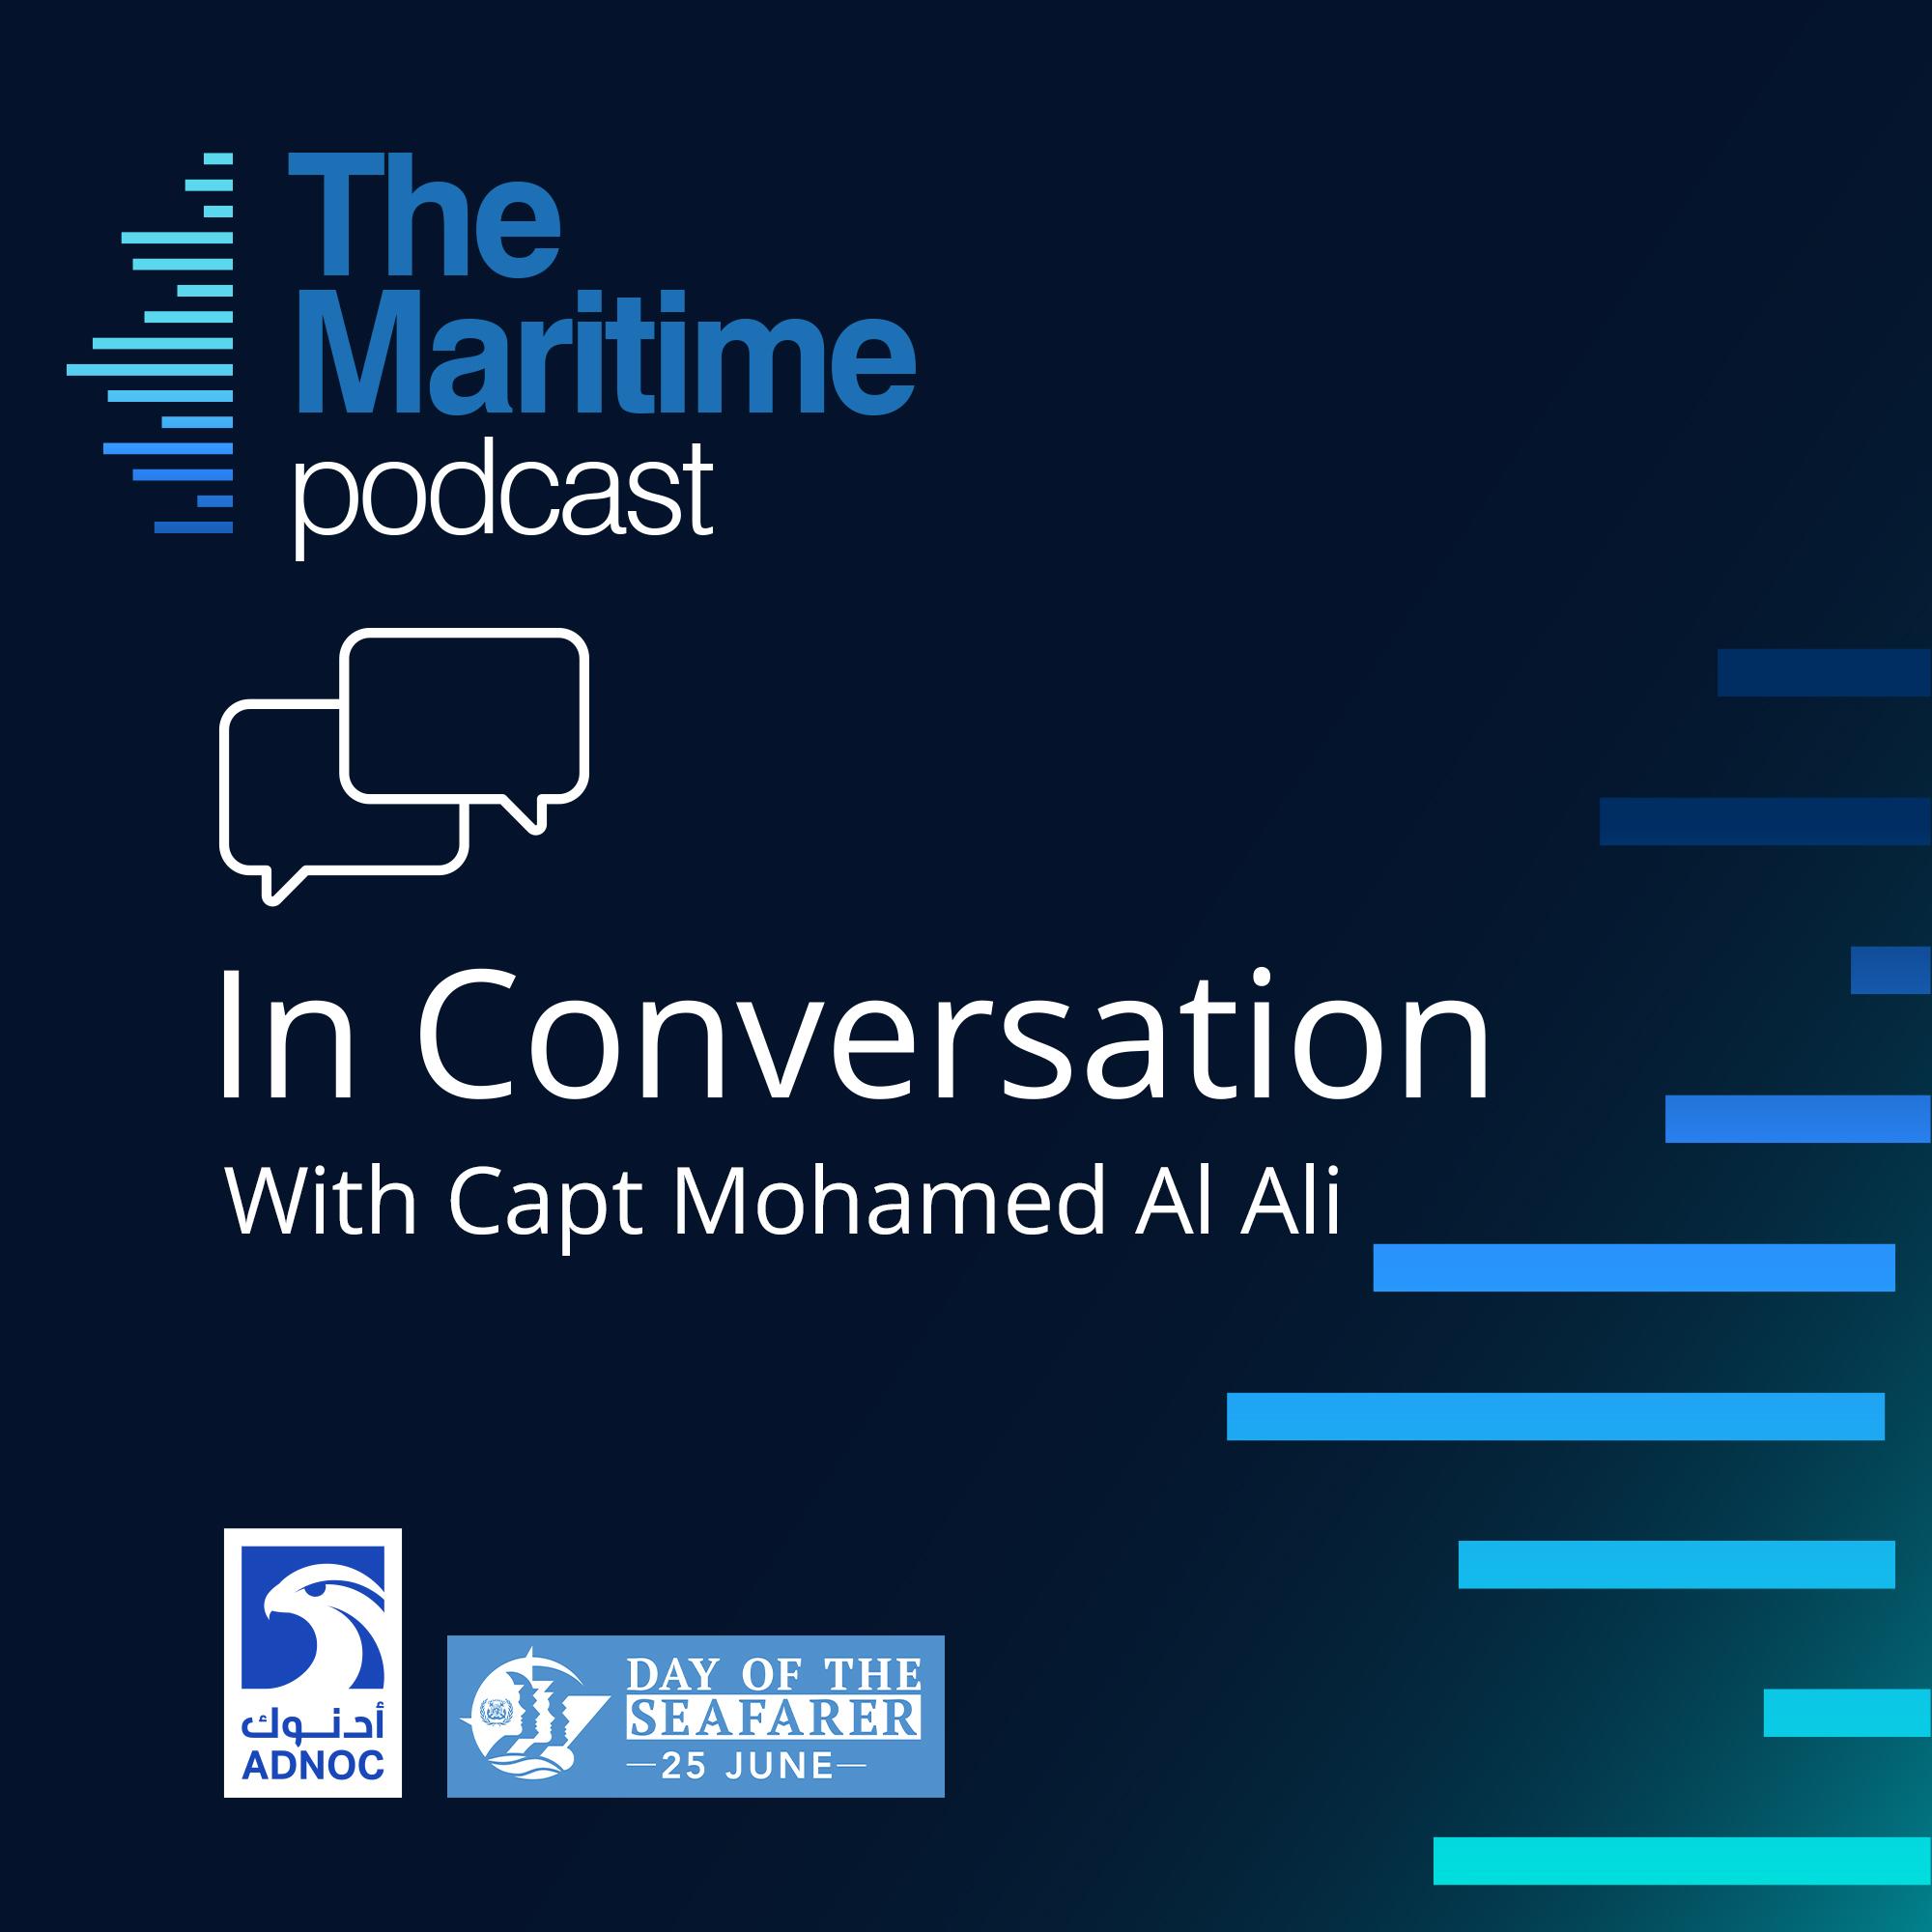 Artwork for podcast The Maritime Podcast